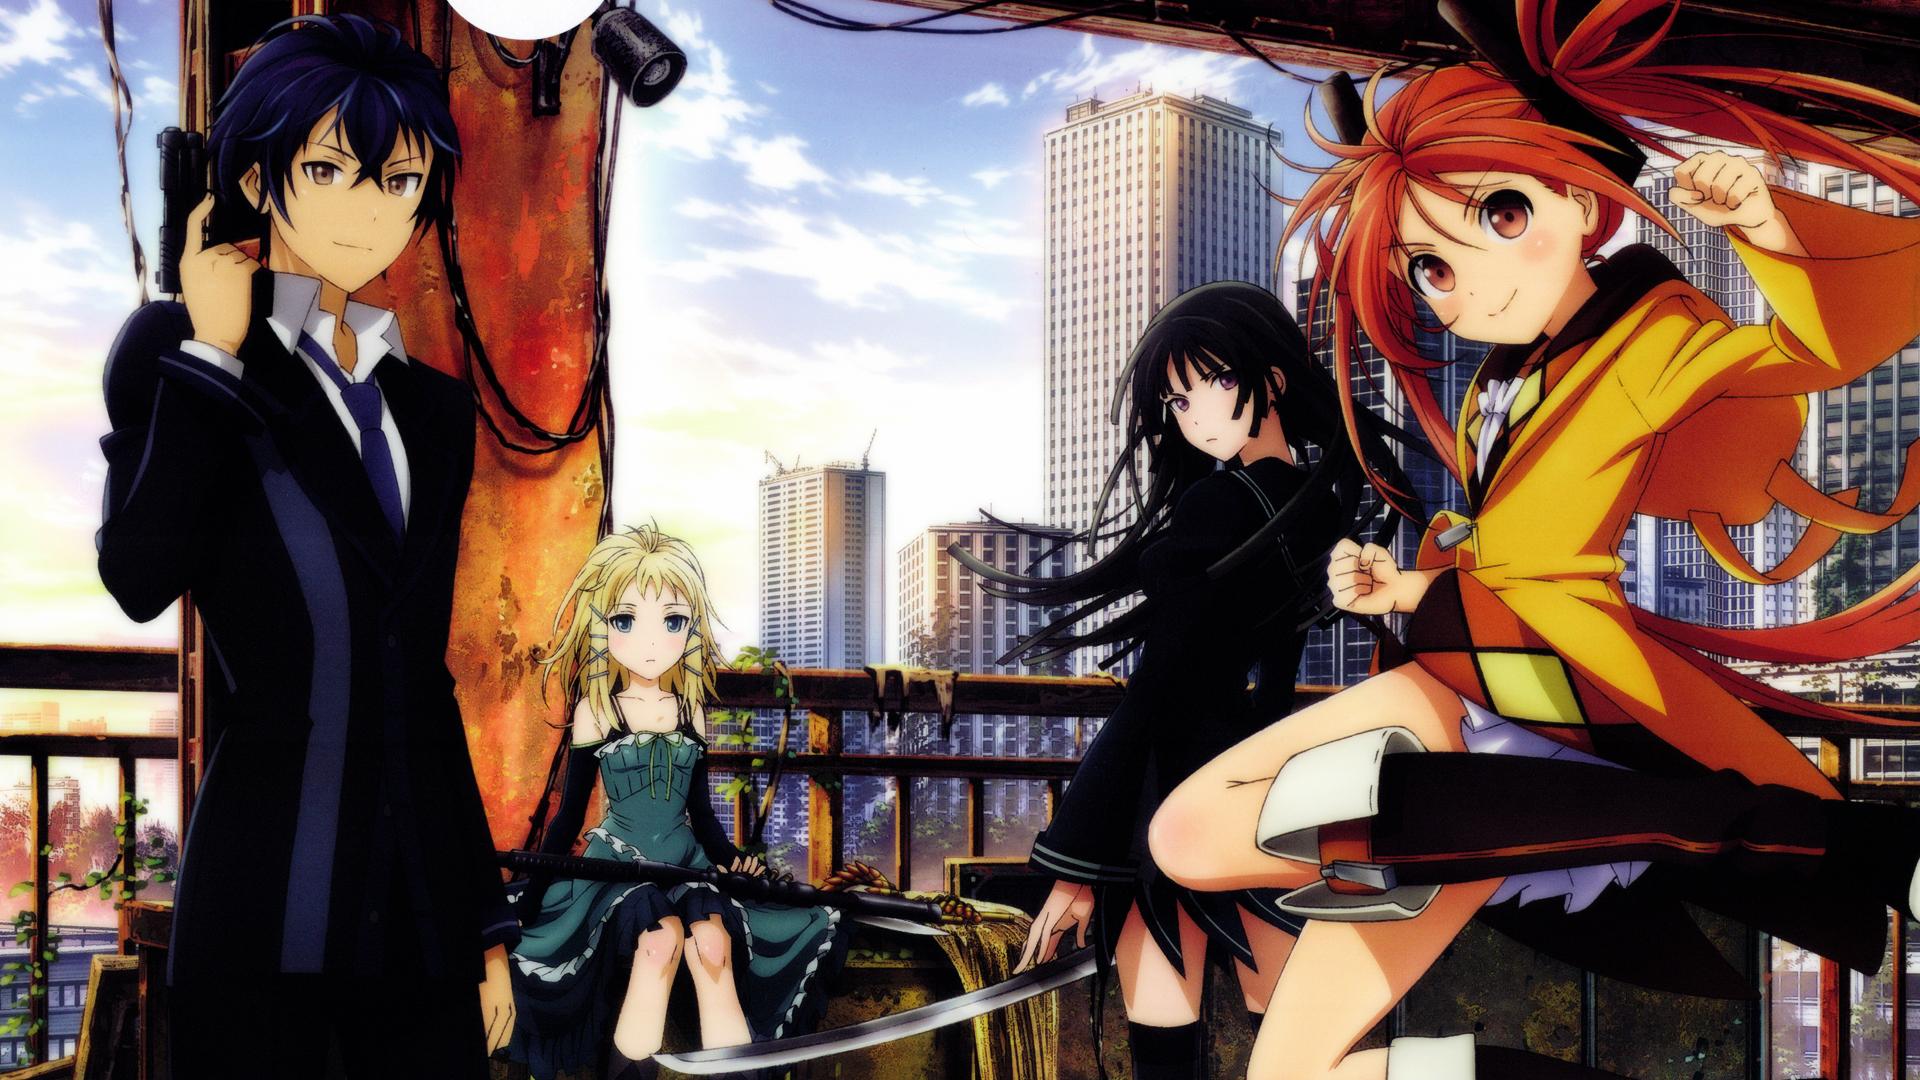 tendo enju aihara black bullet anime hd 1920x1080 1080p wallpaper 1920x1080